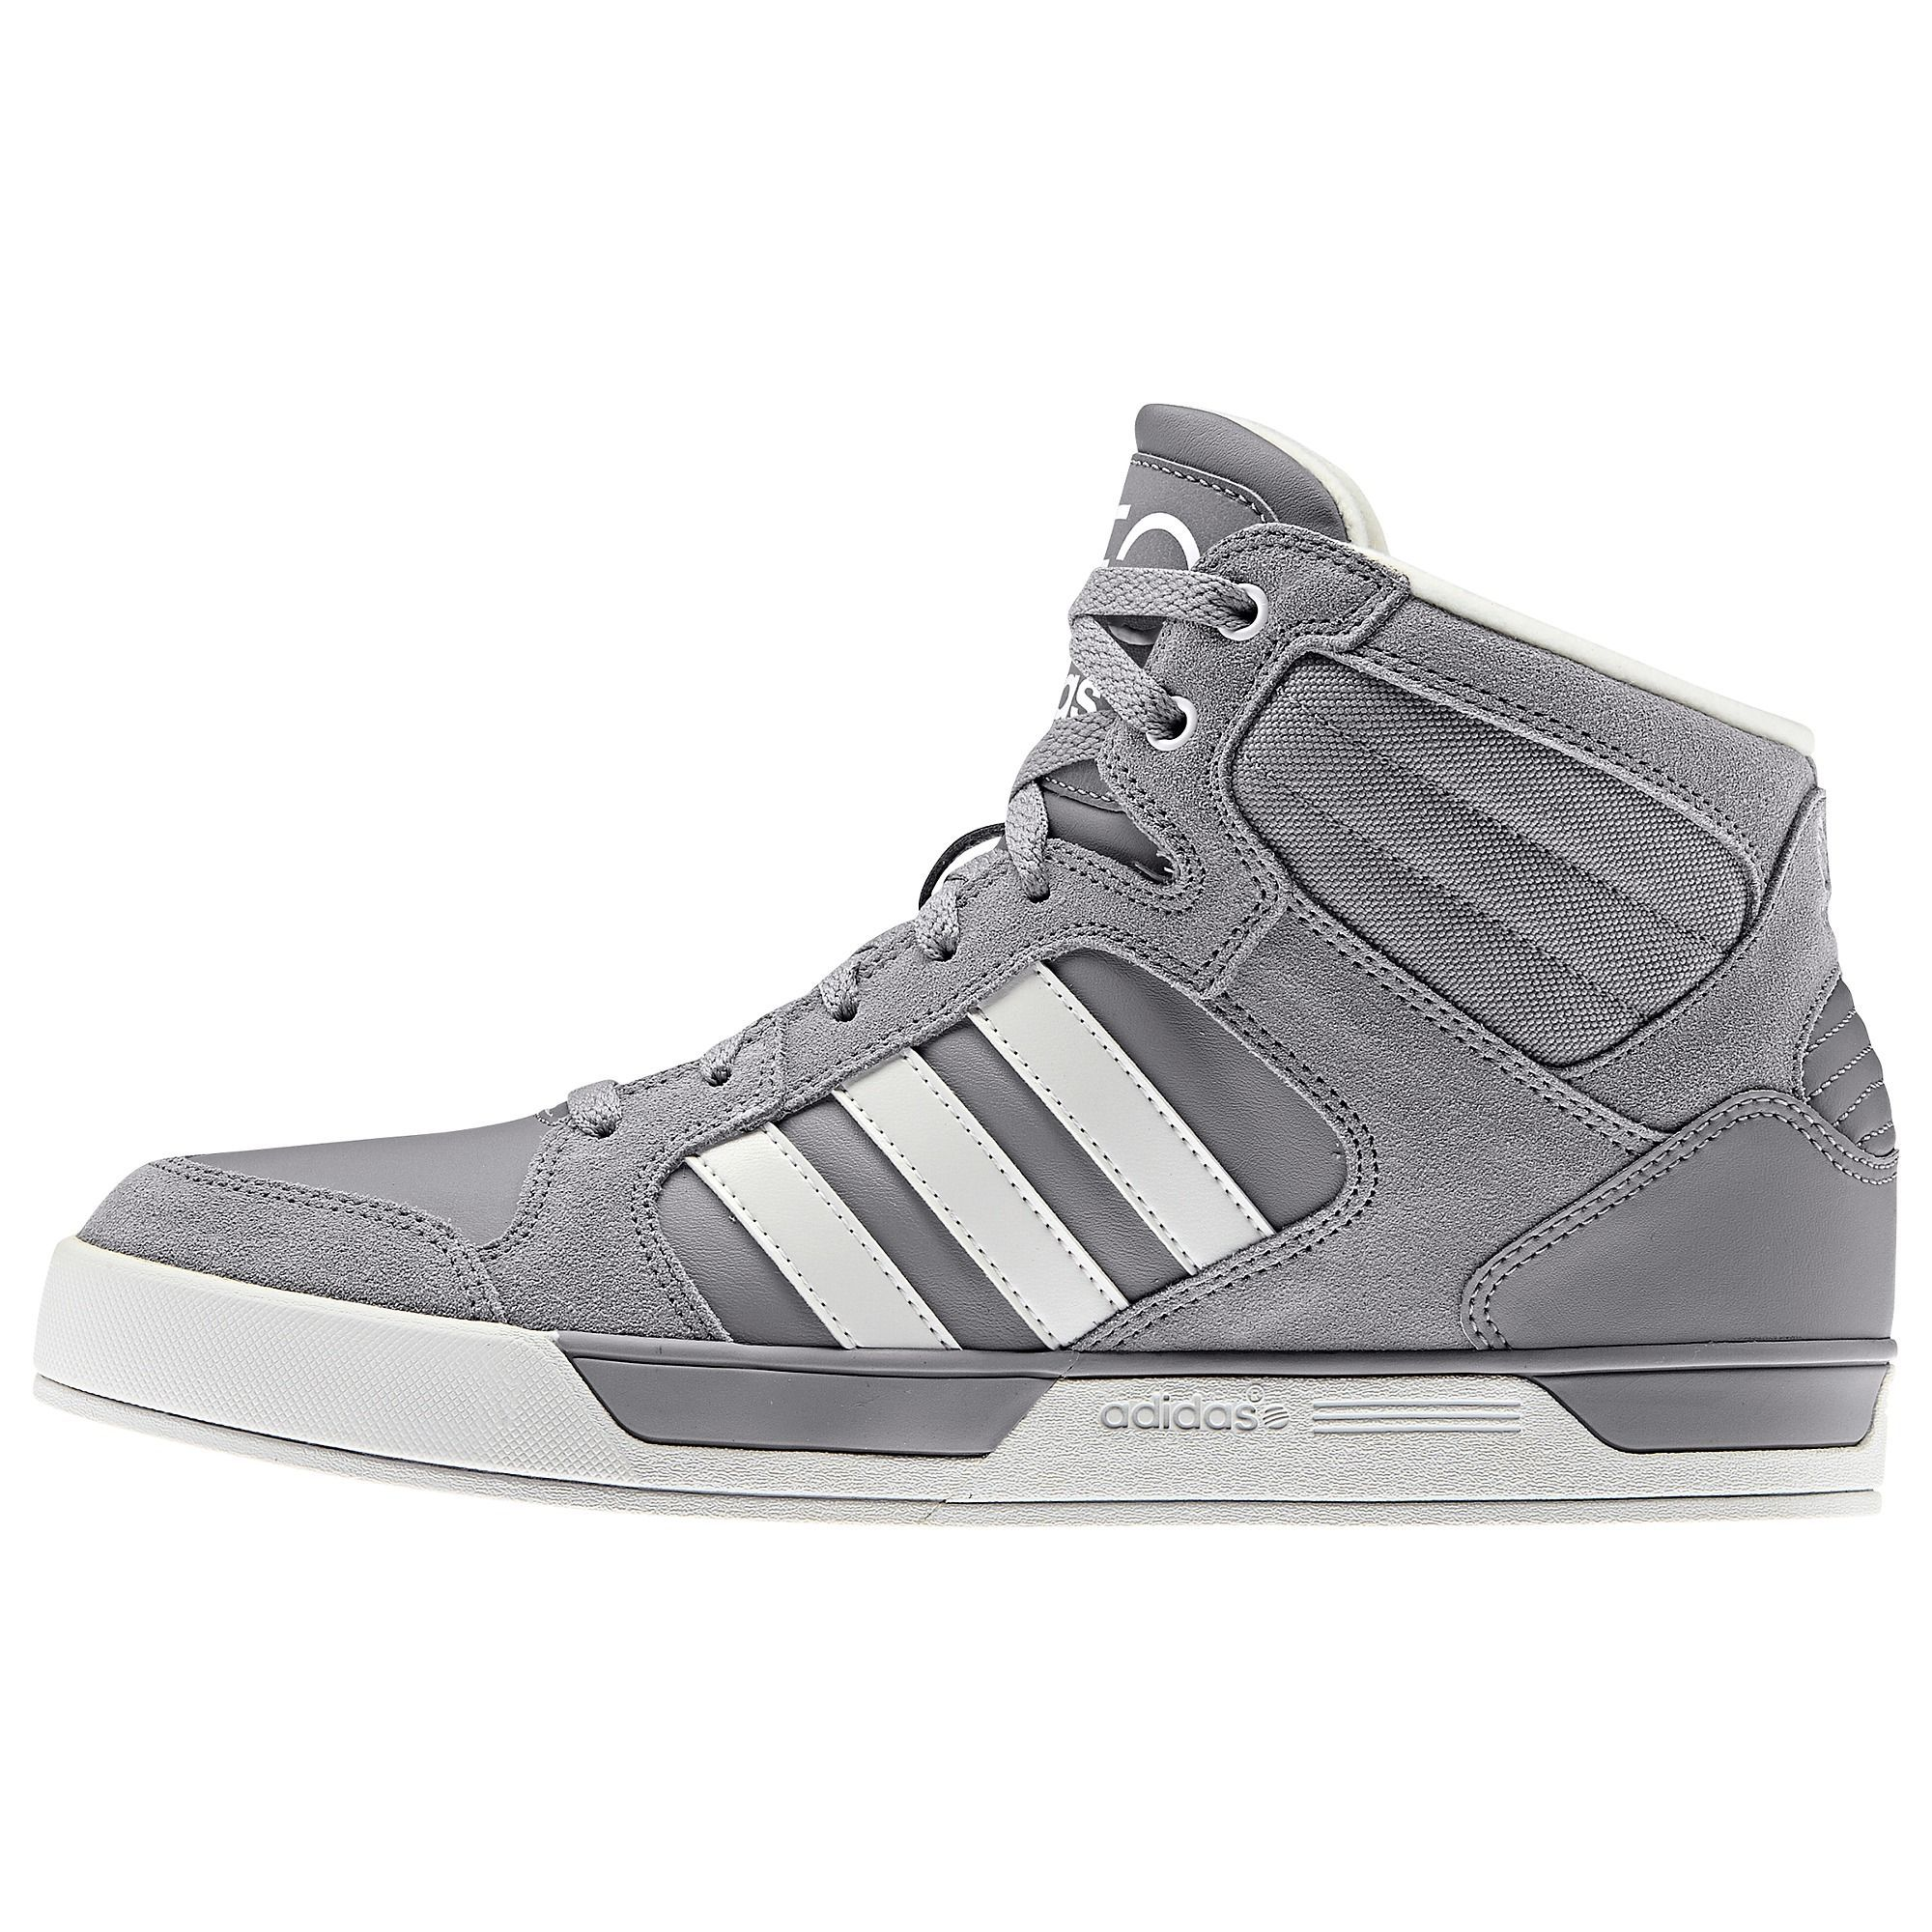 sì adidas bbneo raleigh scarpe casuale desideri pinterest adidas